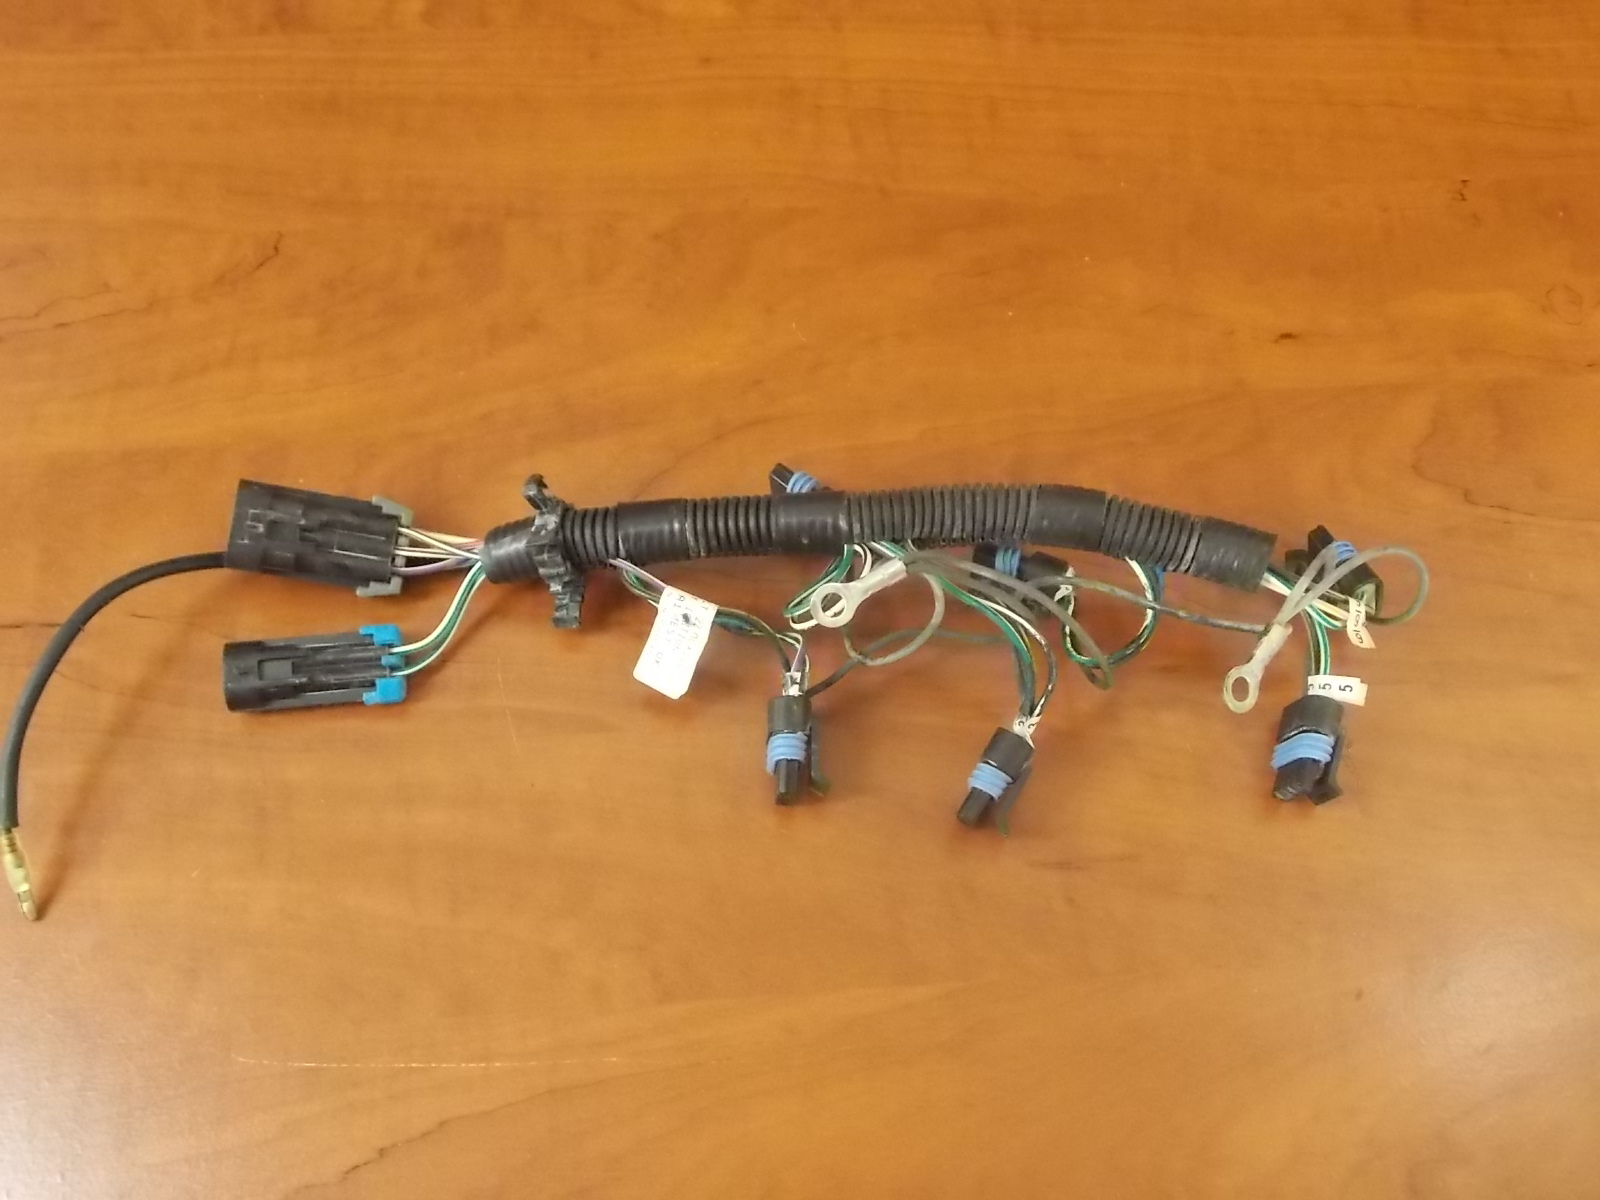 2000 2005 mercury mariner cdm wiring harness 857163t1 135. Black Bedroom Furniture Sets. Home Design Ideas